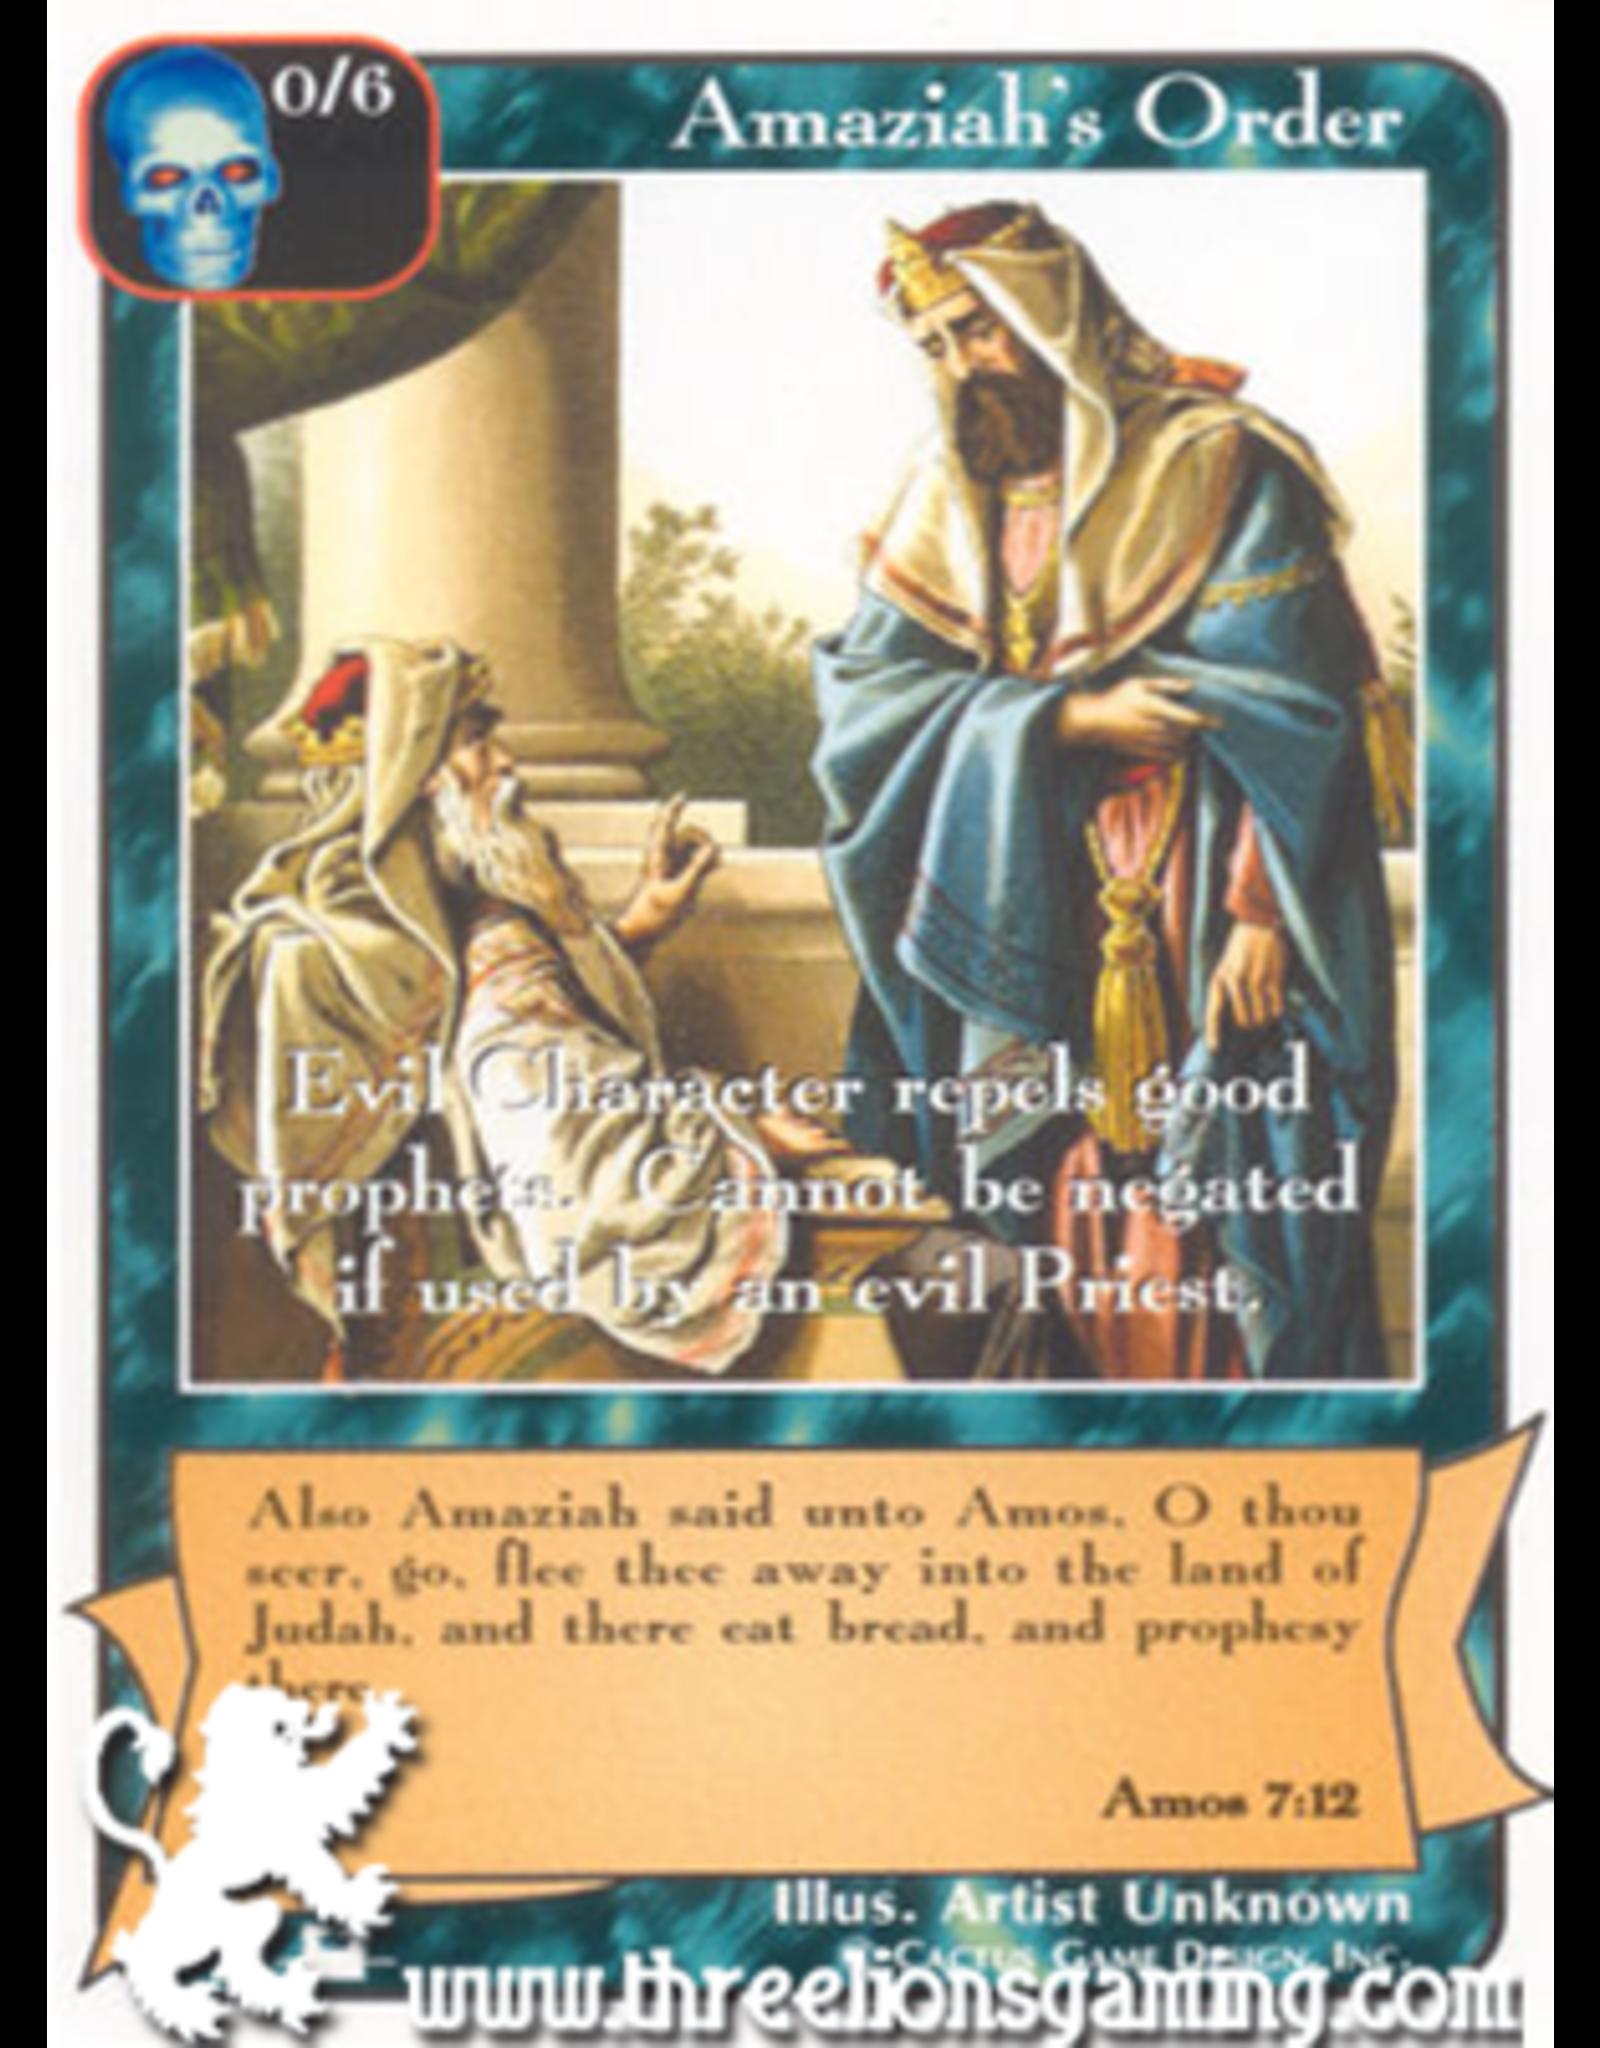 Priests: Amaziah's Order